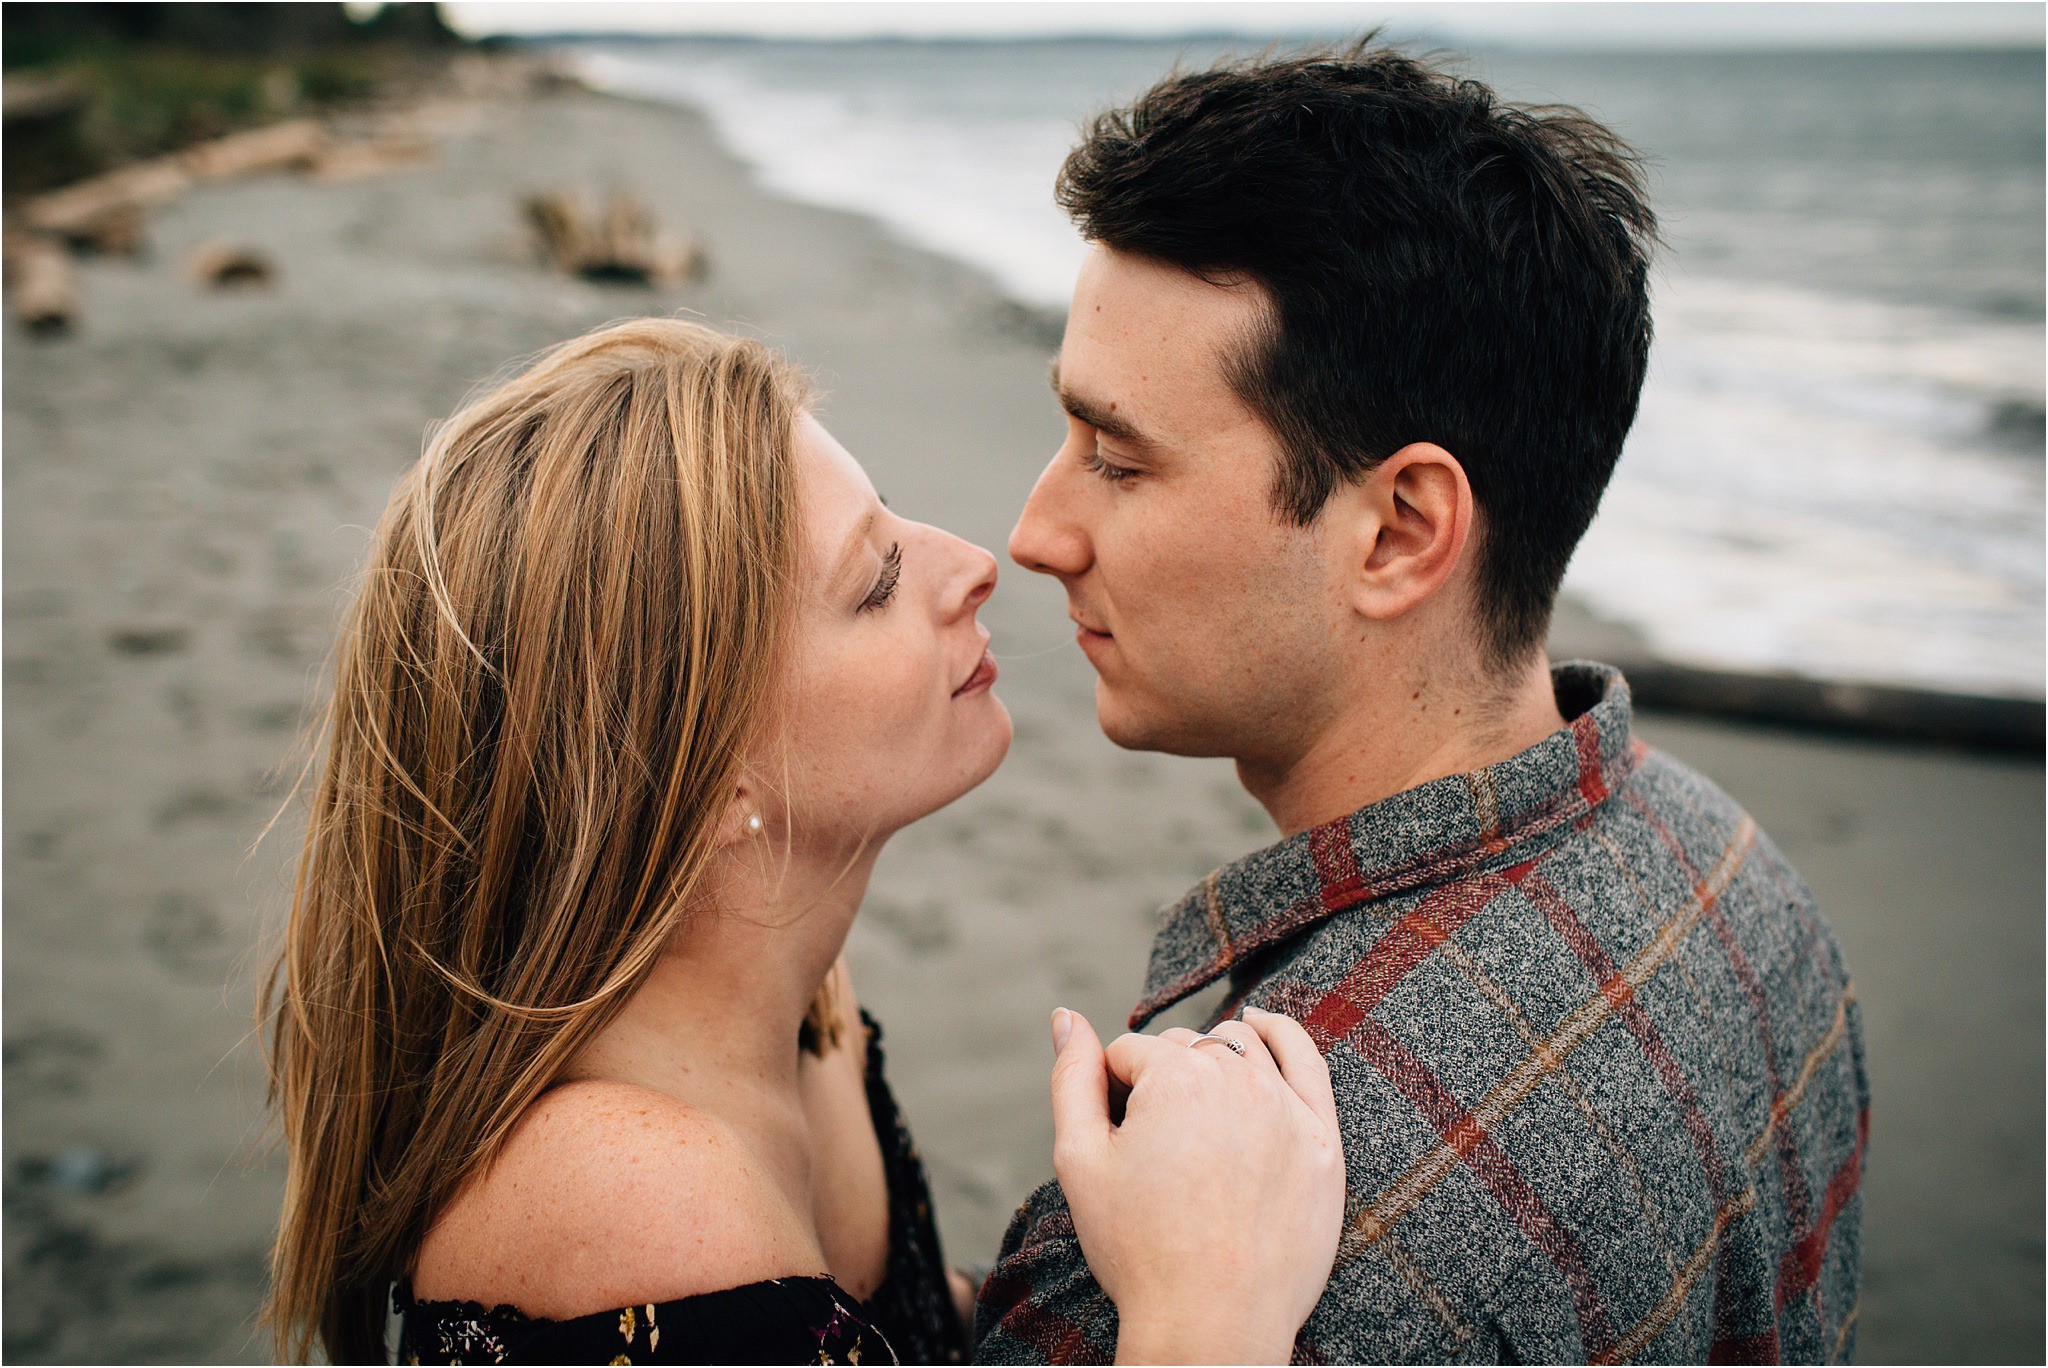 oak-harbor-couples-photographer-deception-pass-55.jpg